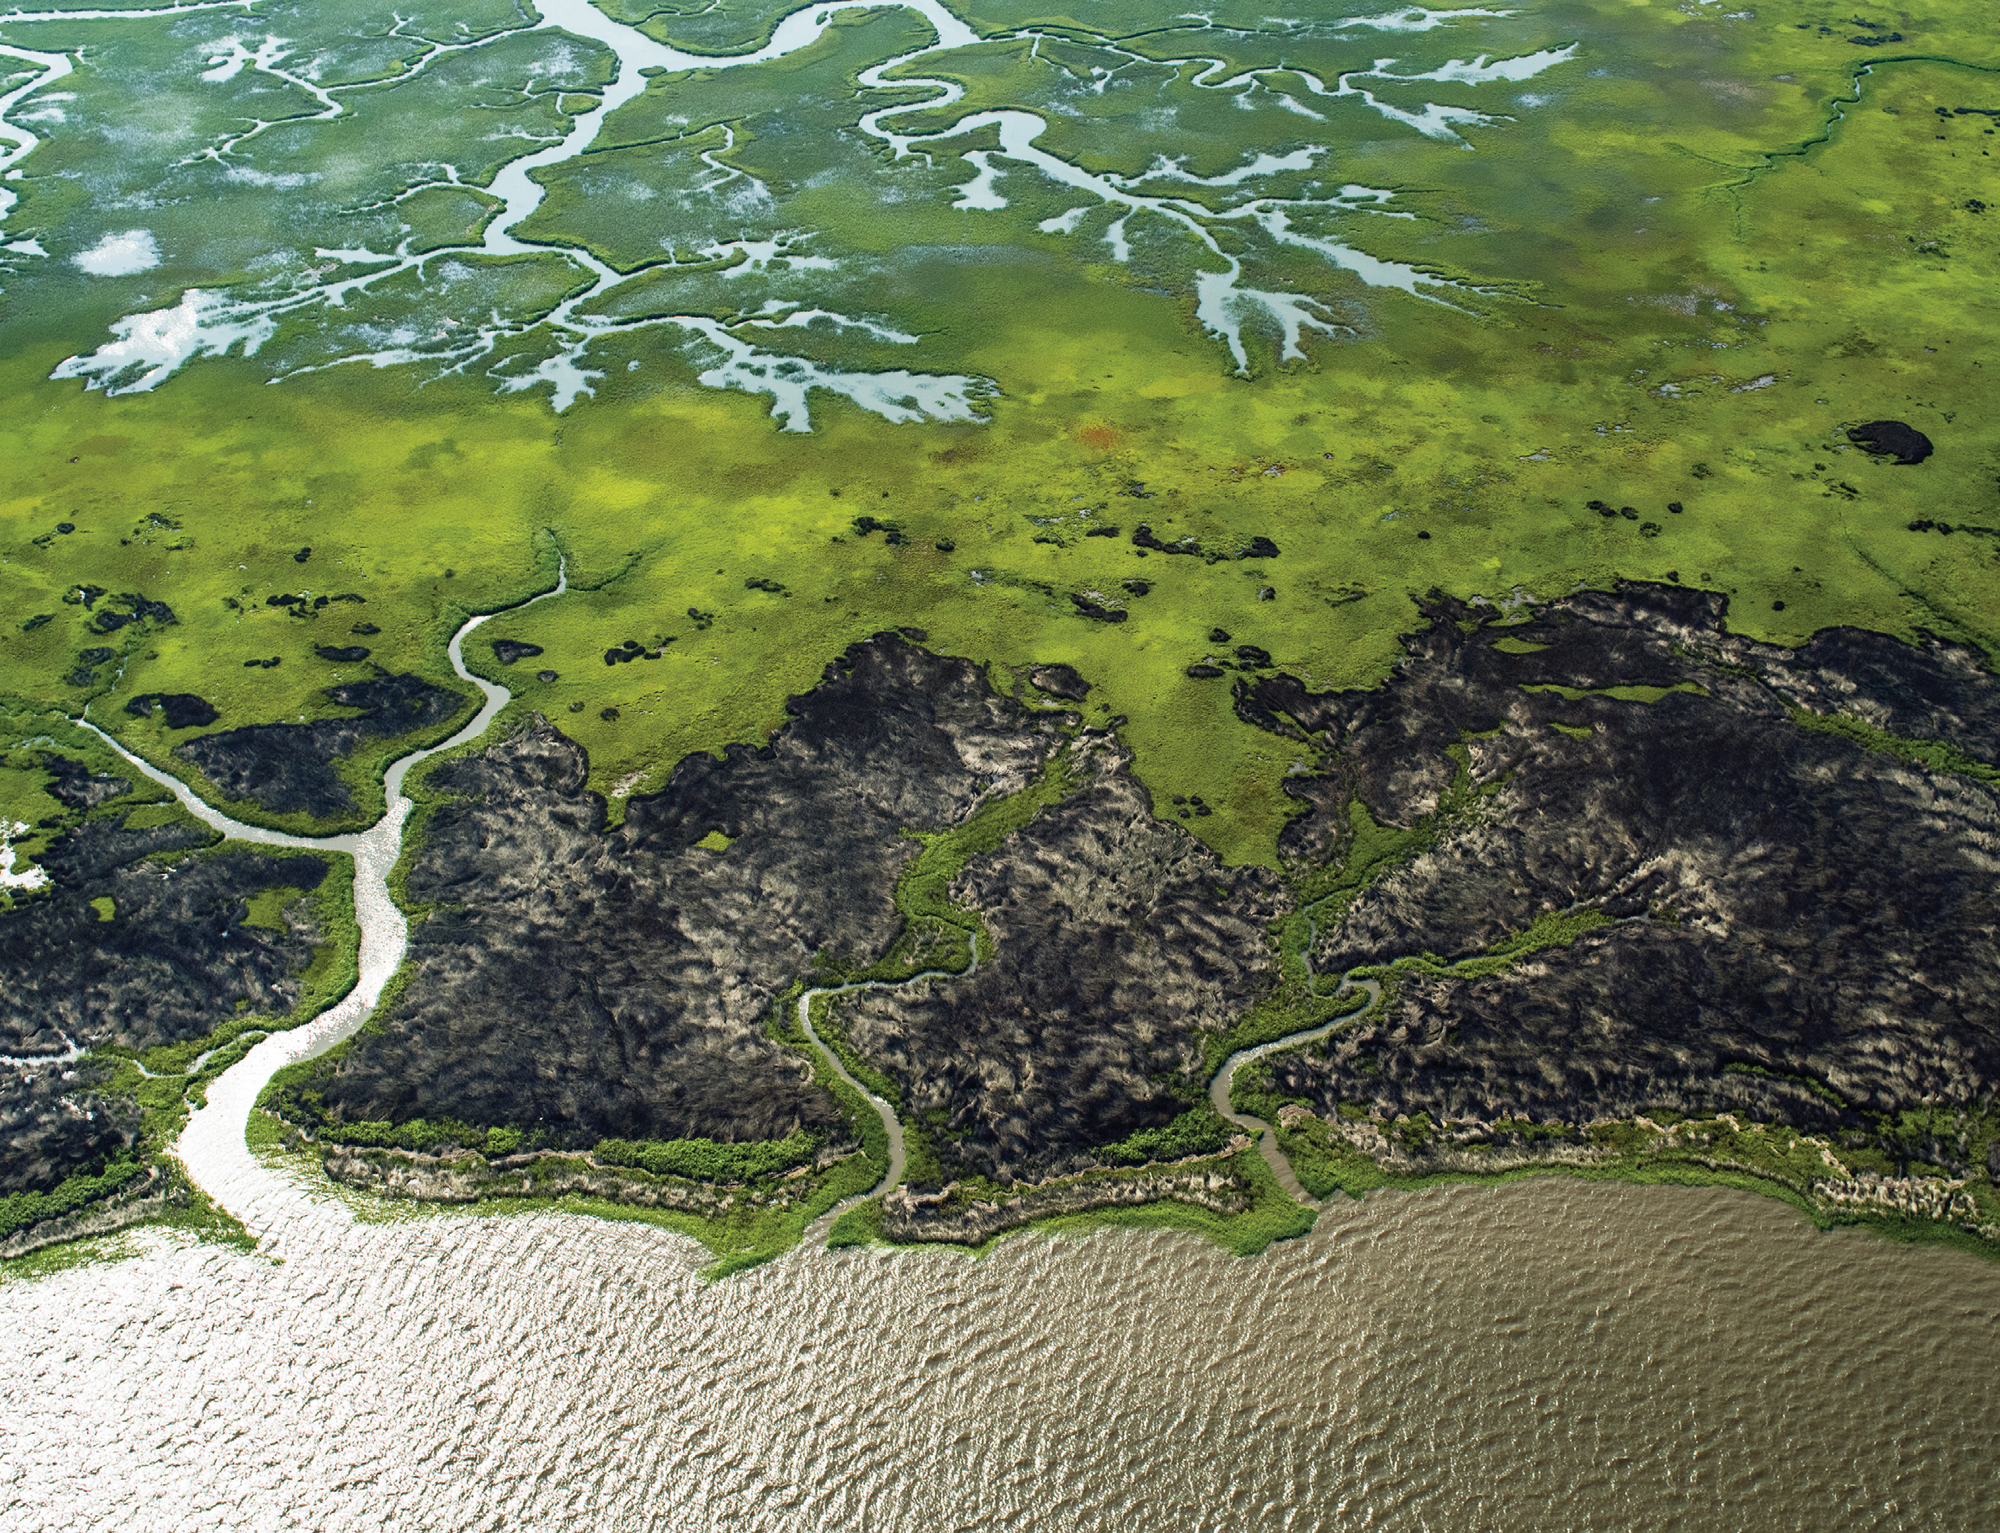 Coastal Wetlands Meet the Ocean (Winyah Bay National Estuarine Research Reserve; July 2, 2015)